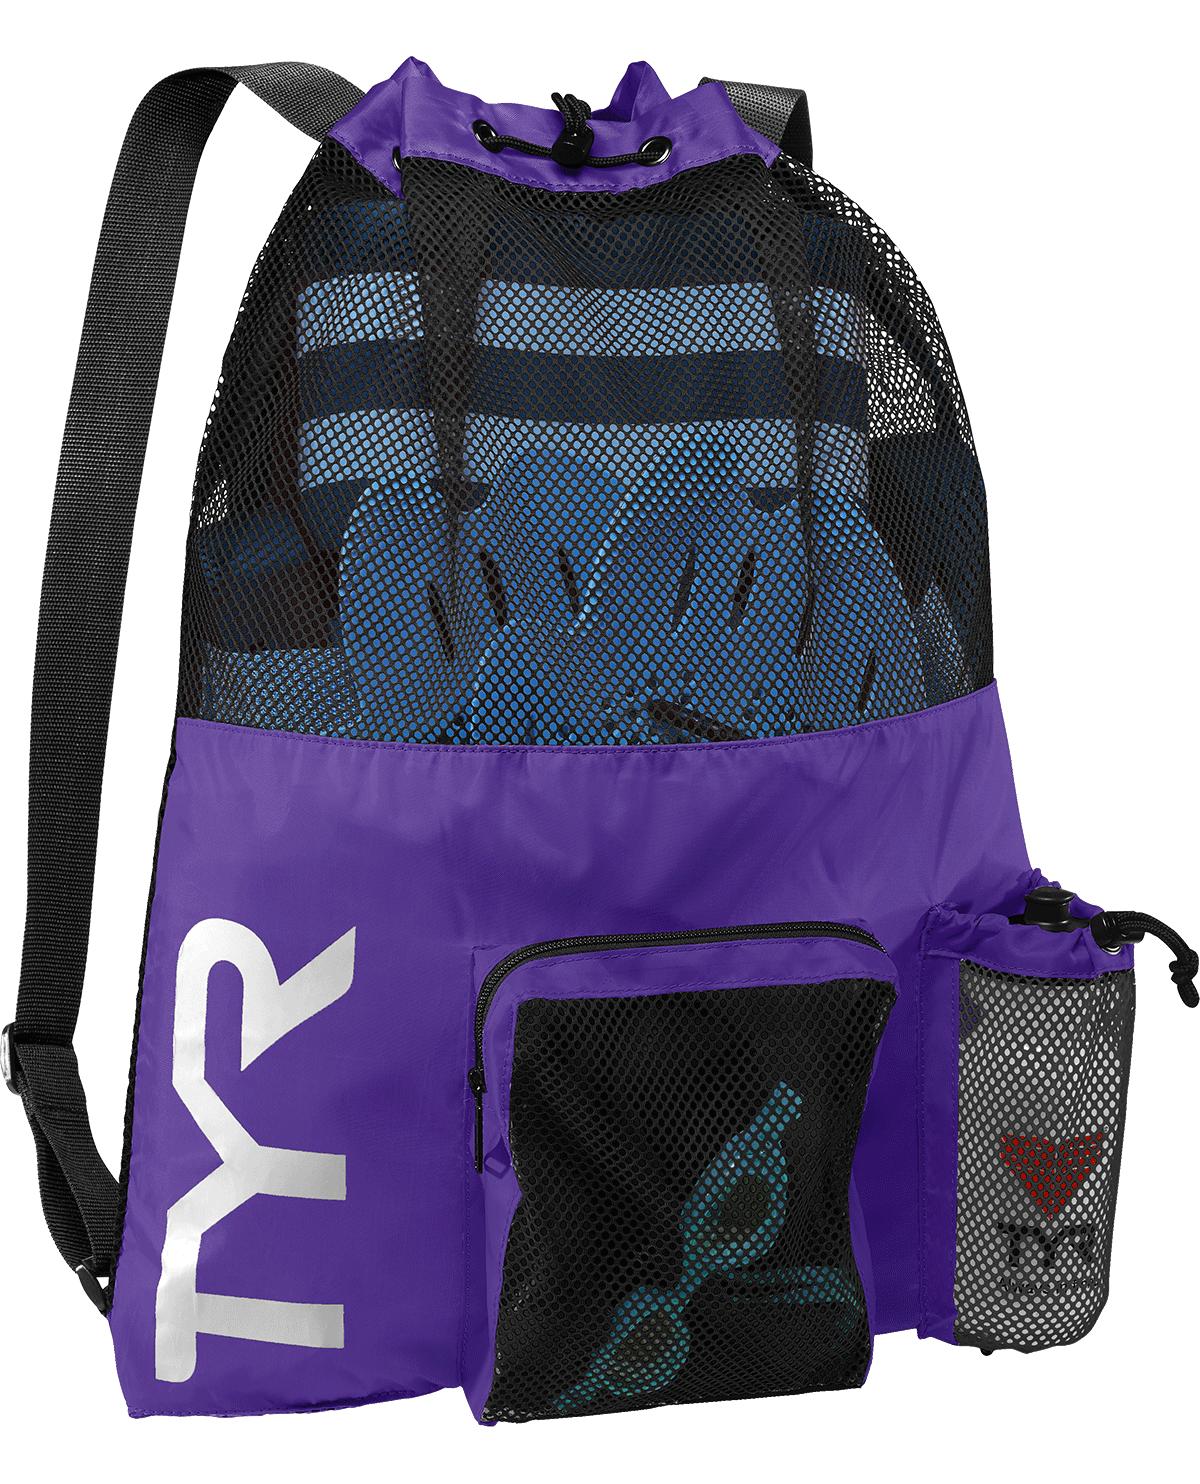 42b91f5587cc49 Tyr Swim Bags – Jerusalem House